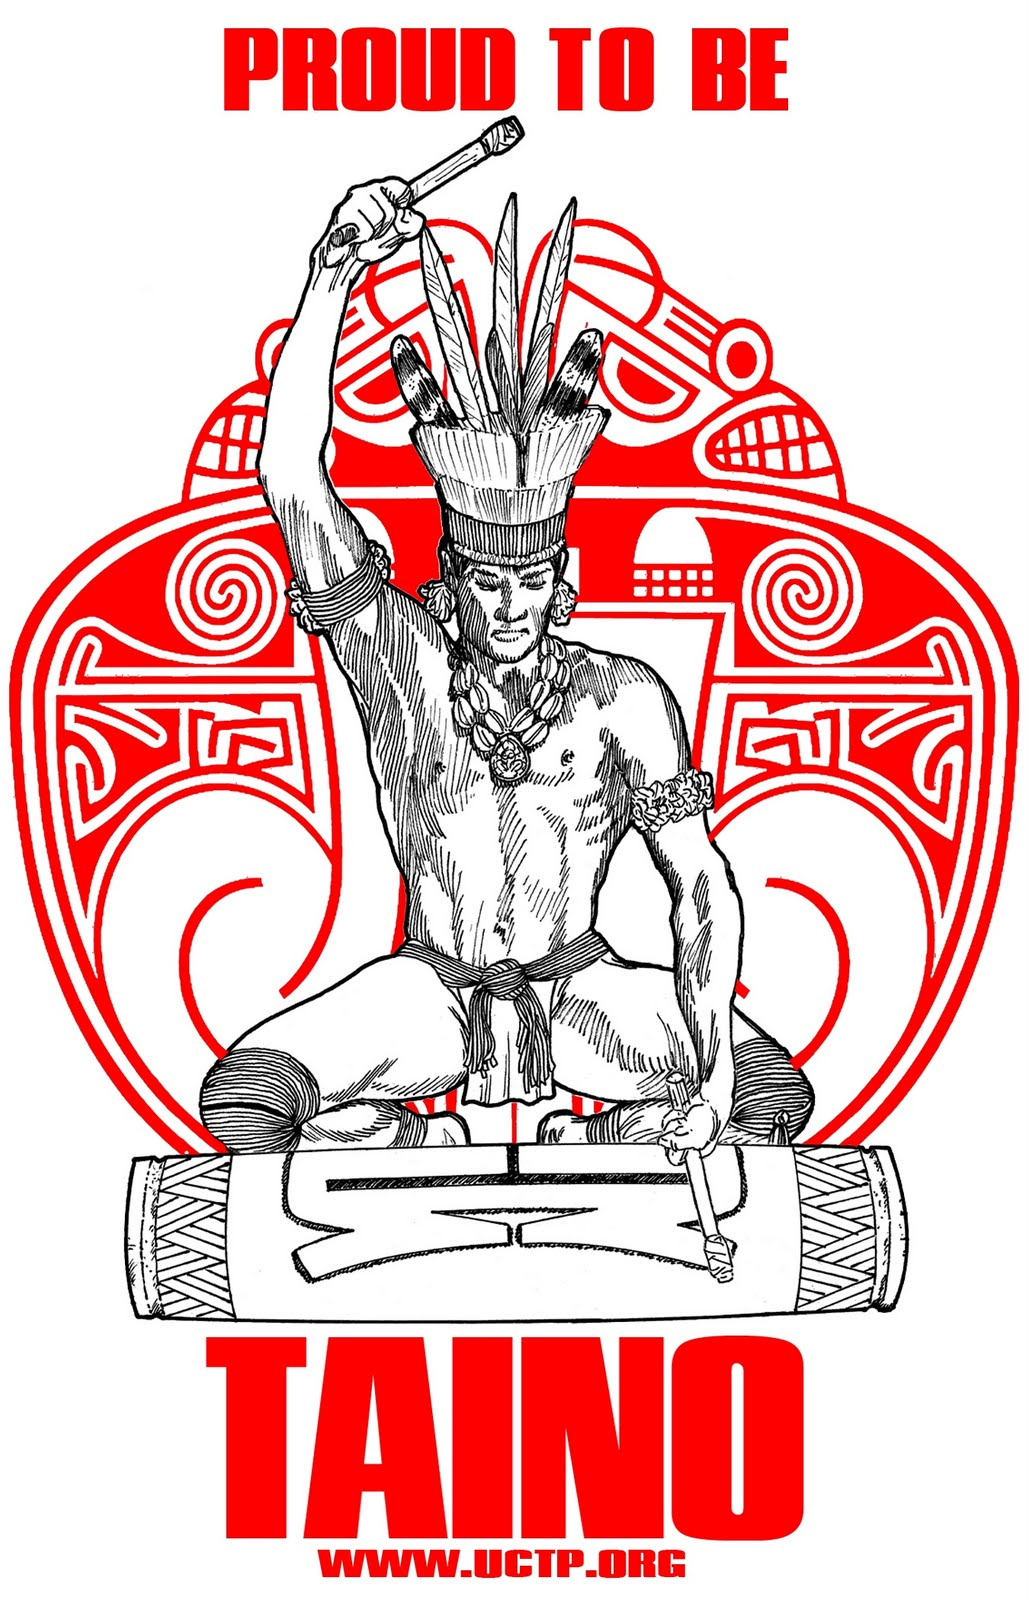 Puerto Rico Taino Symbols